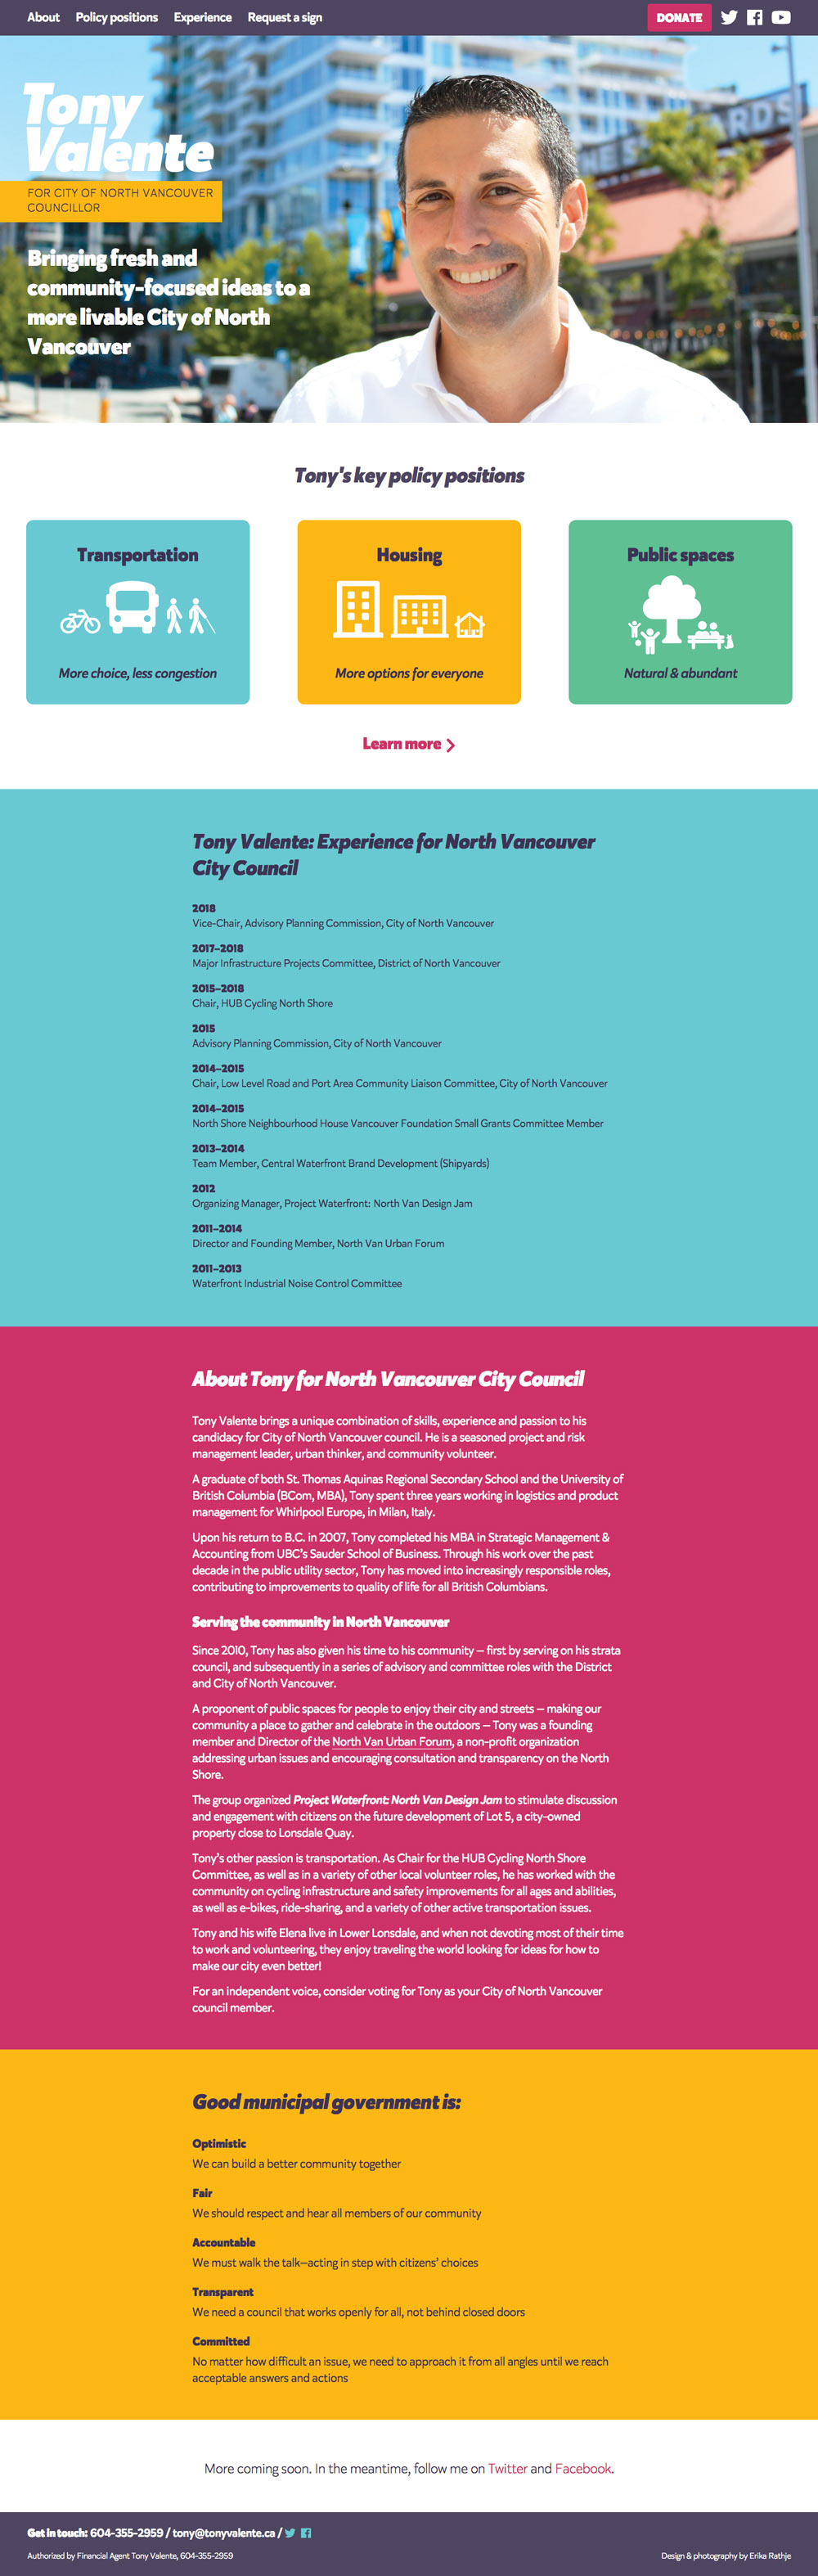 Tony Valente homepage